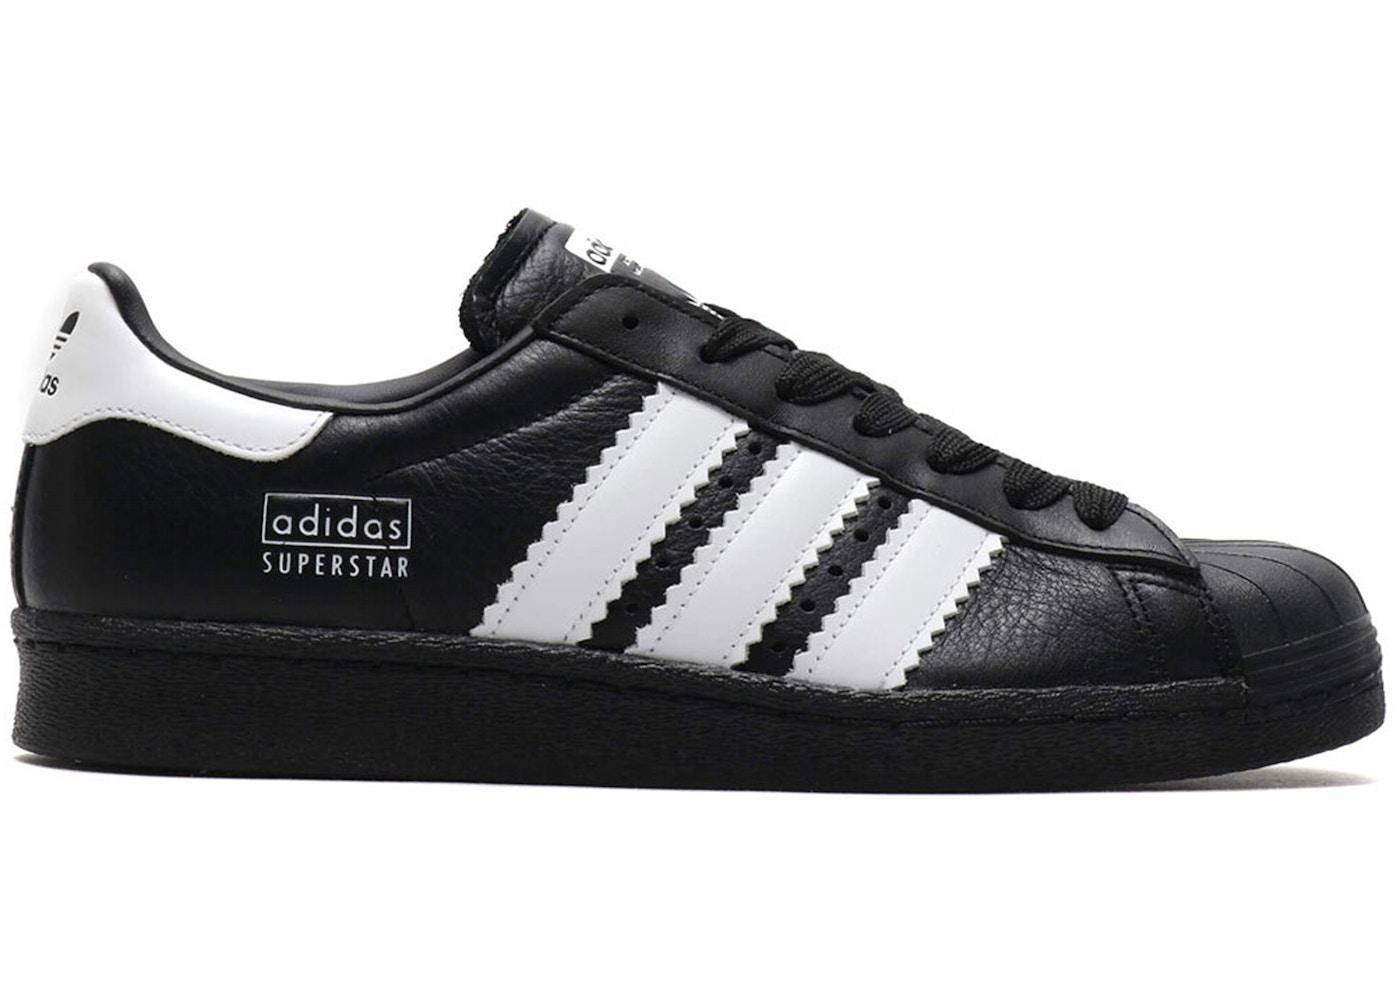 65adac85 adidas Superstar 80s Enlarged Stripes Black - BD7363